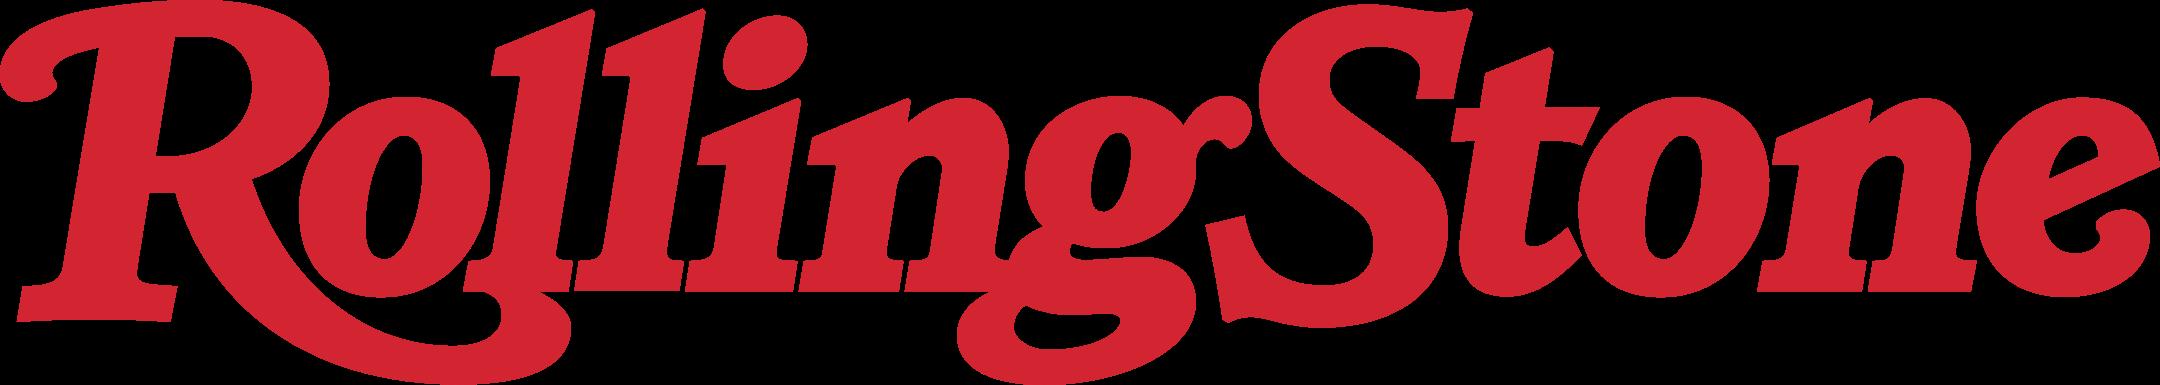 rolling stone logo 1 - Rolling Stone Logo